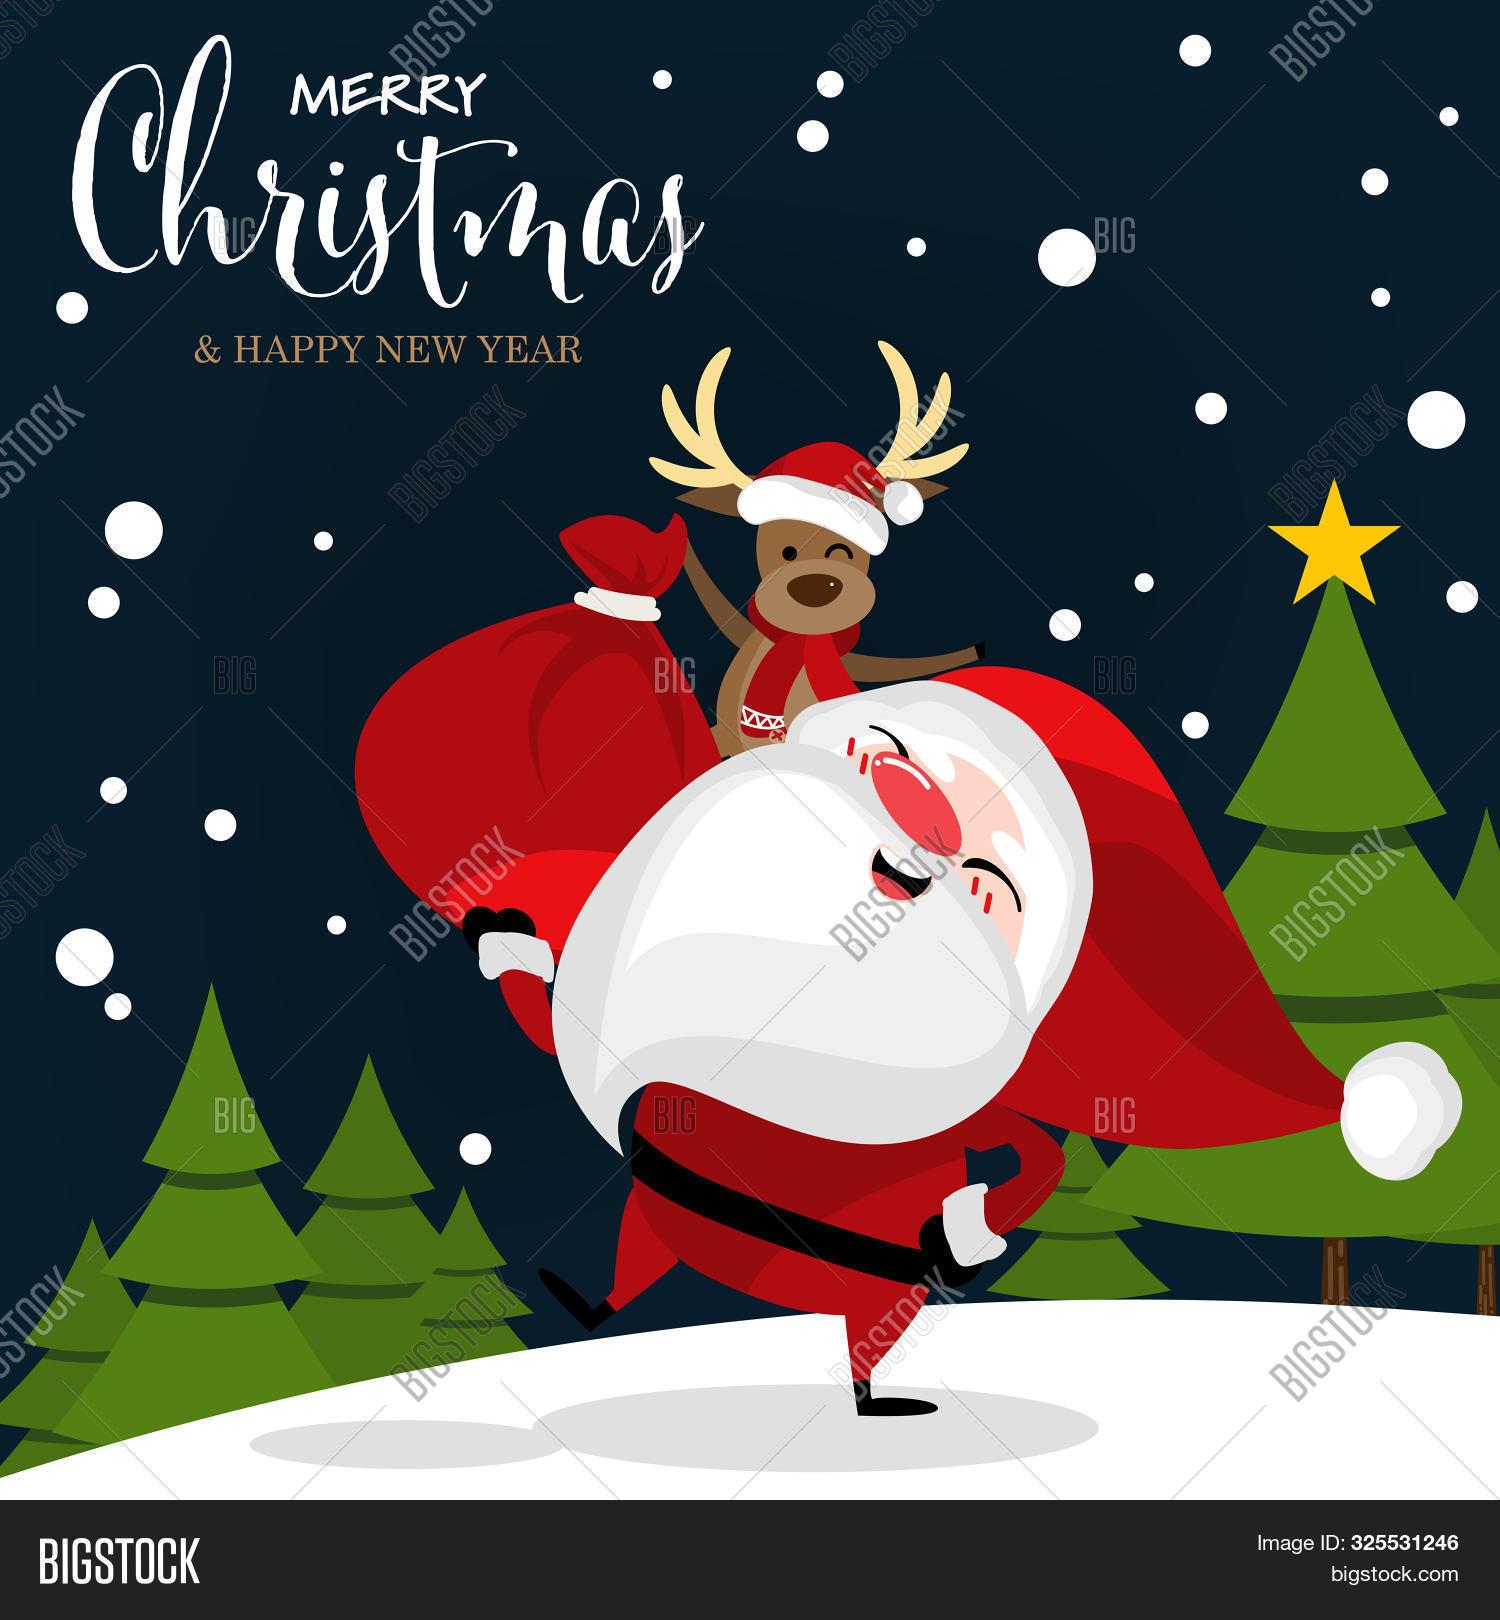 Christmas Cartoon Of Santa Claus, Reindeer, Christmas Tree On Snow Hill And Merry Christmas Text. Cu